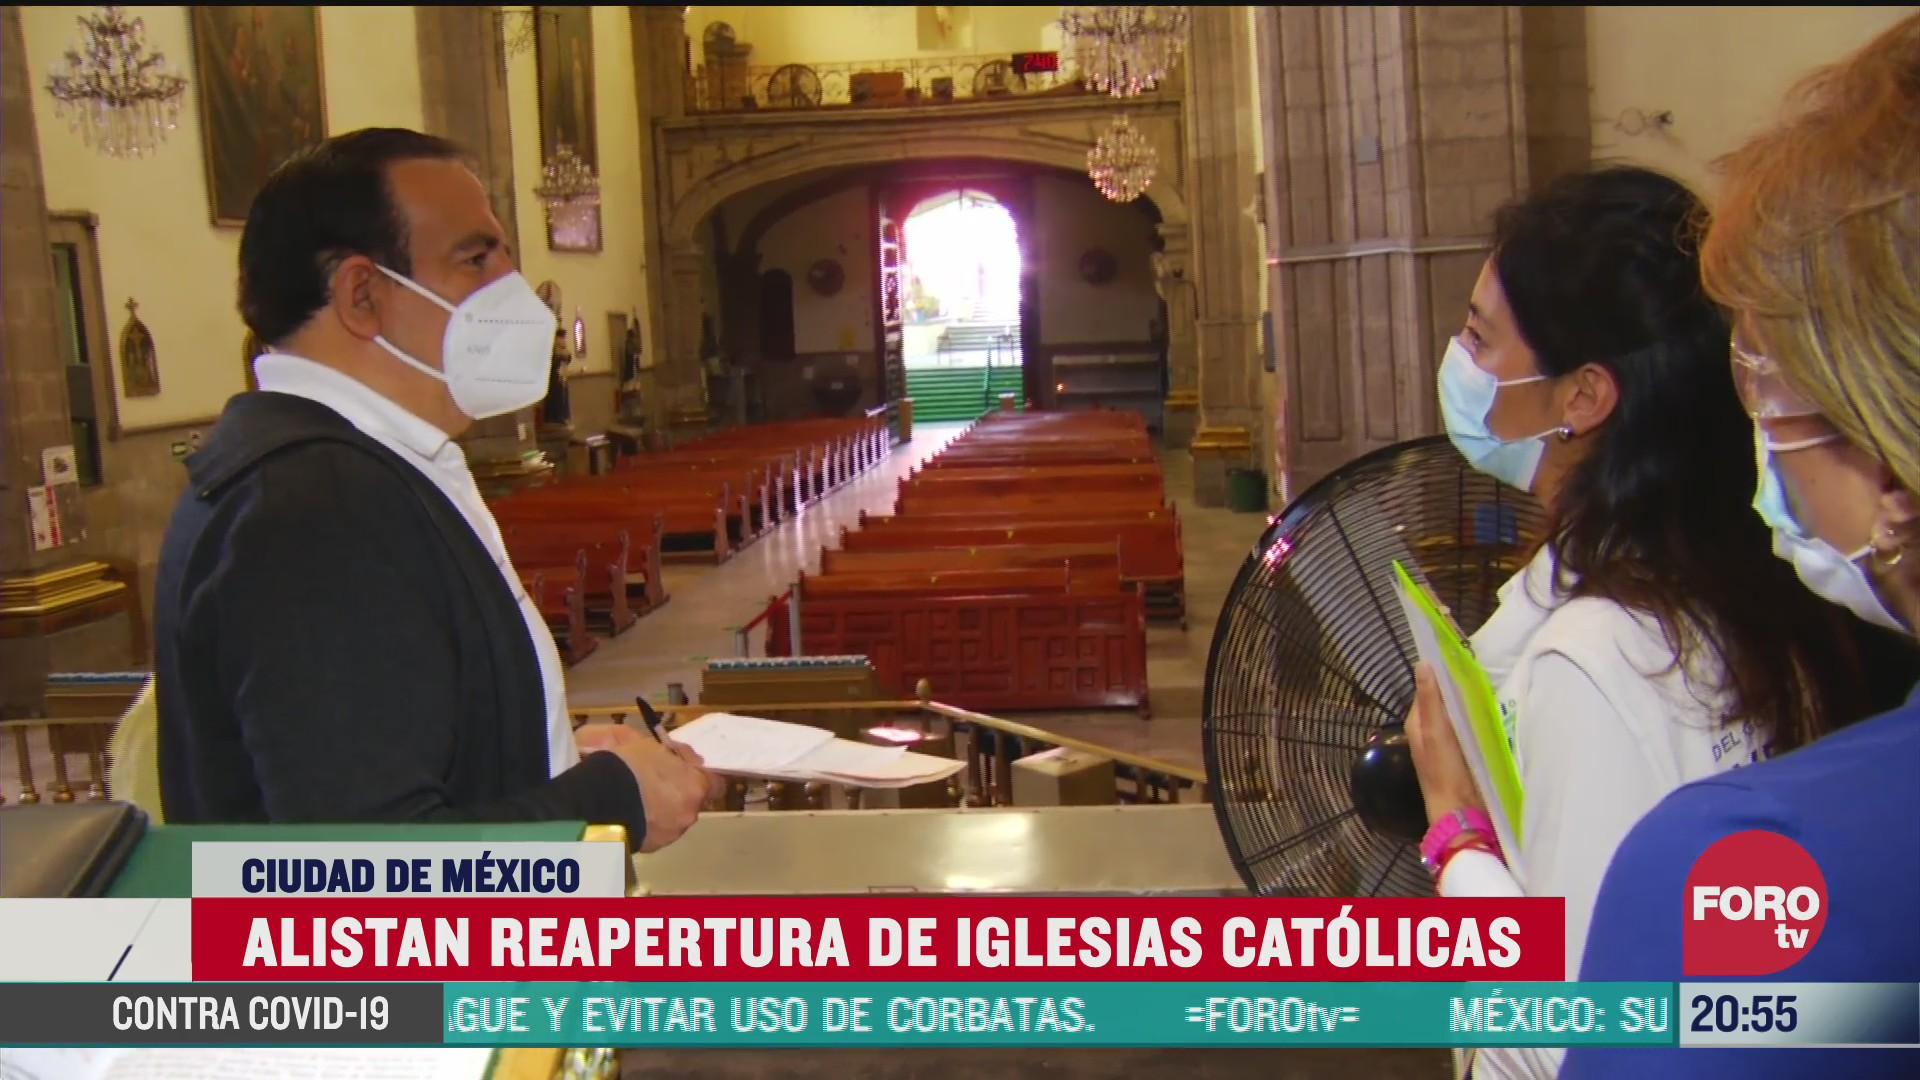 iglesias catolicas se preparan para su reapertura tras confinamiento por coronavirus